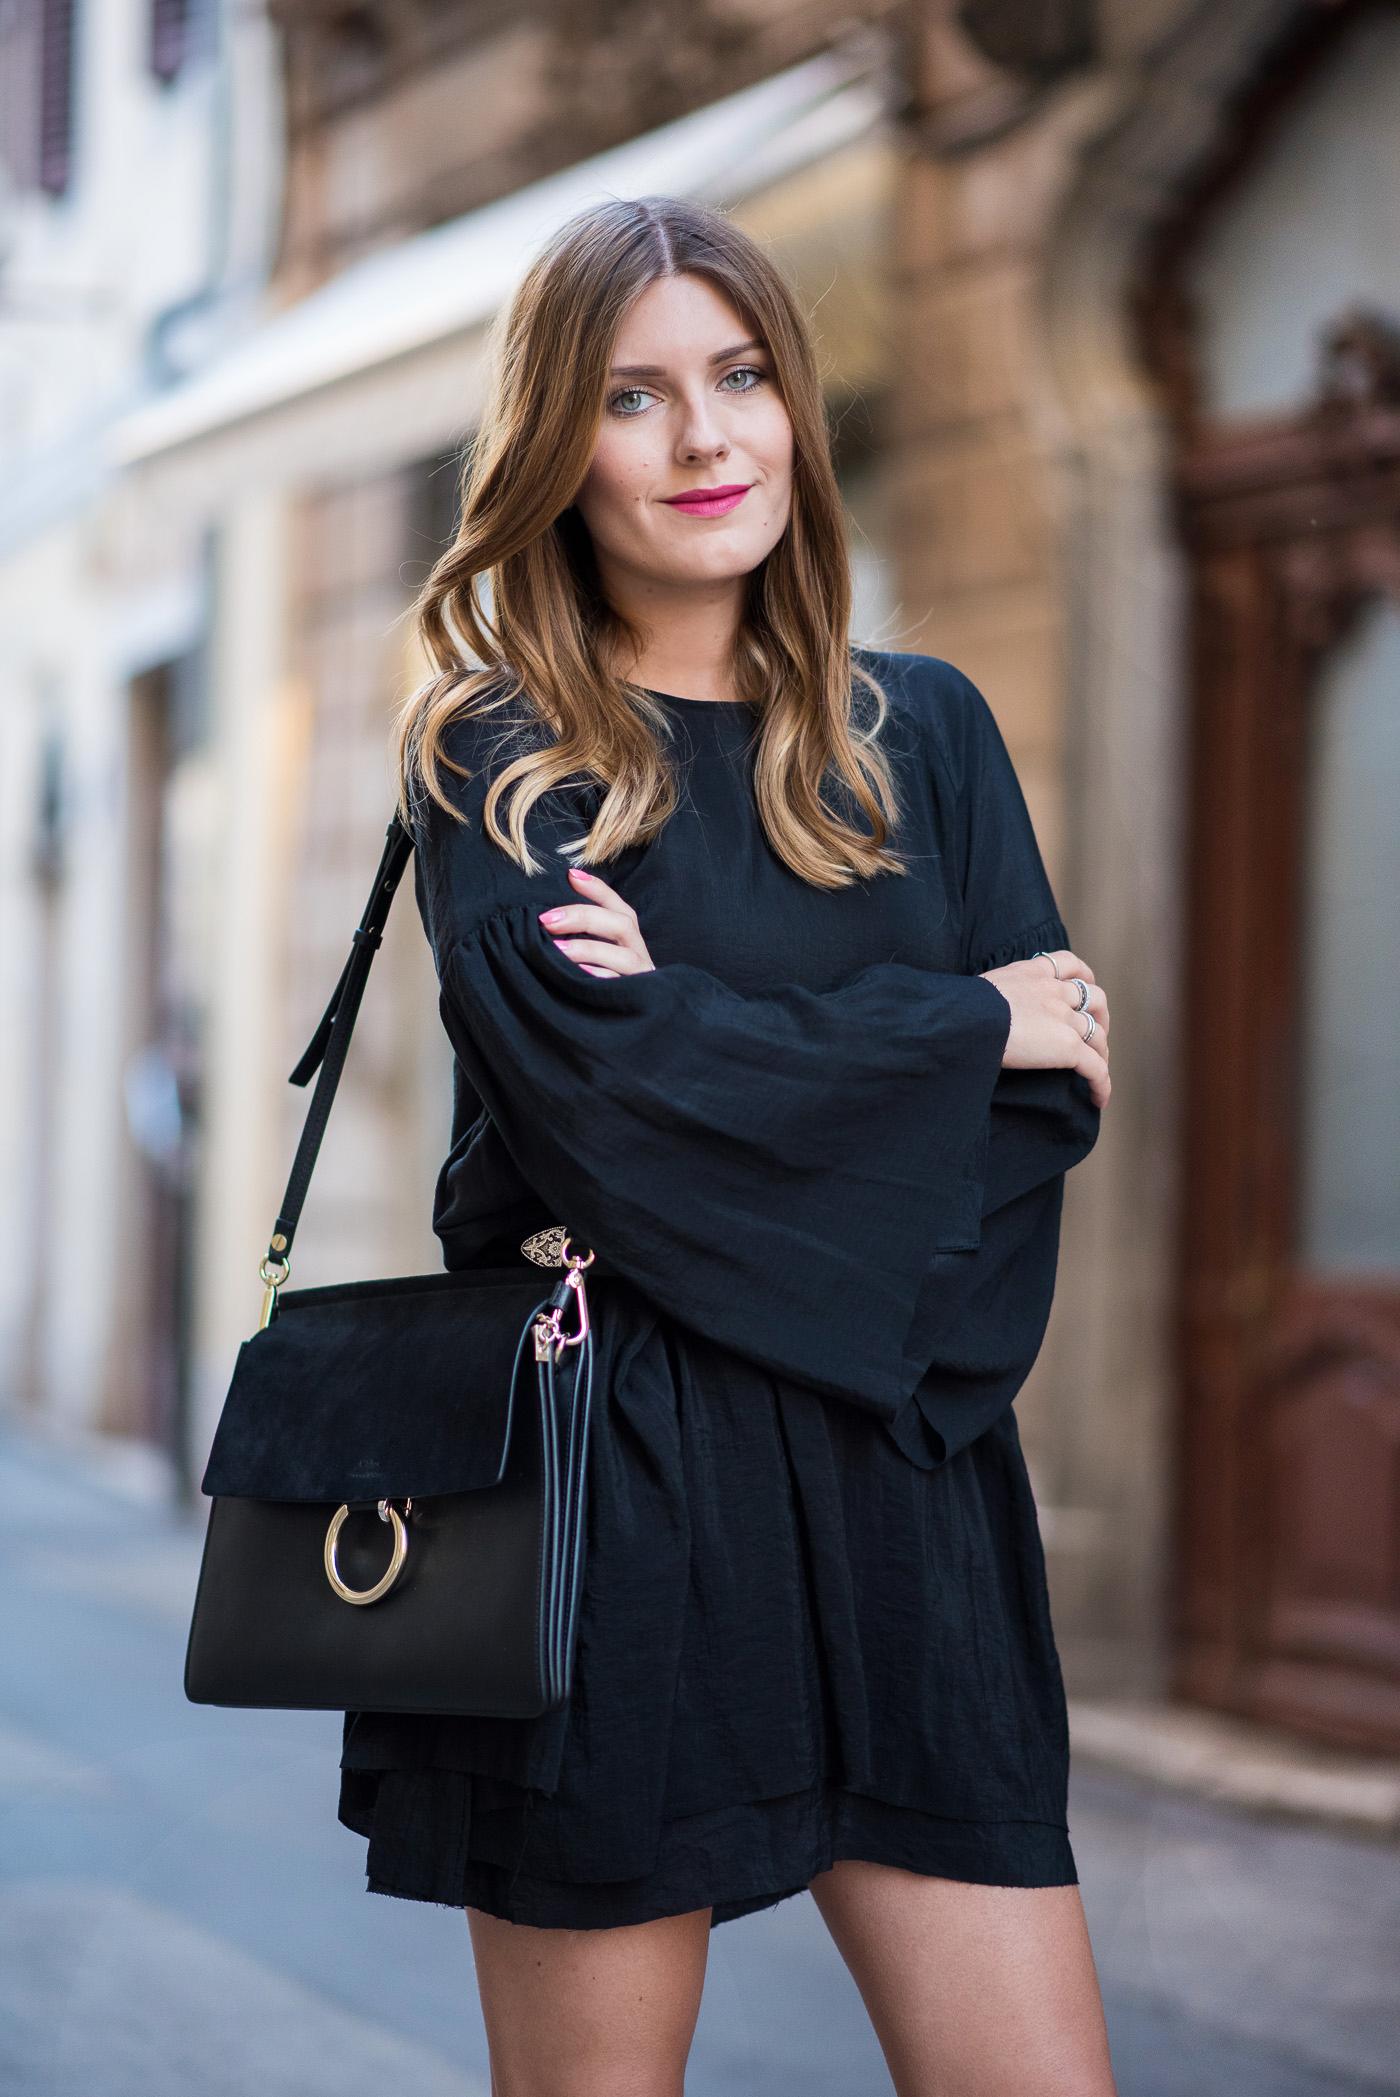 Little_Black_Dress_Birkenstock_Summer_Outfit_2